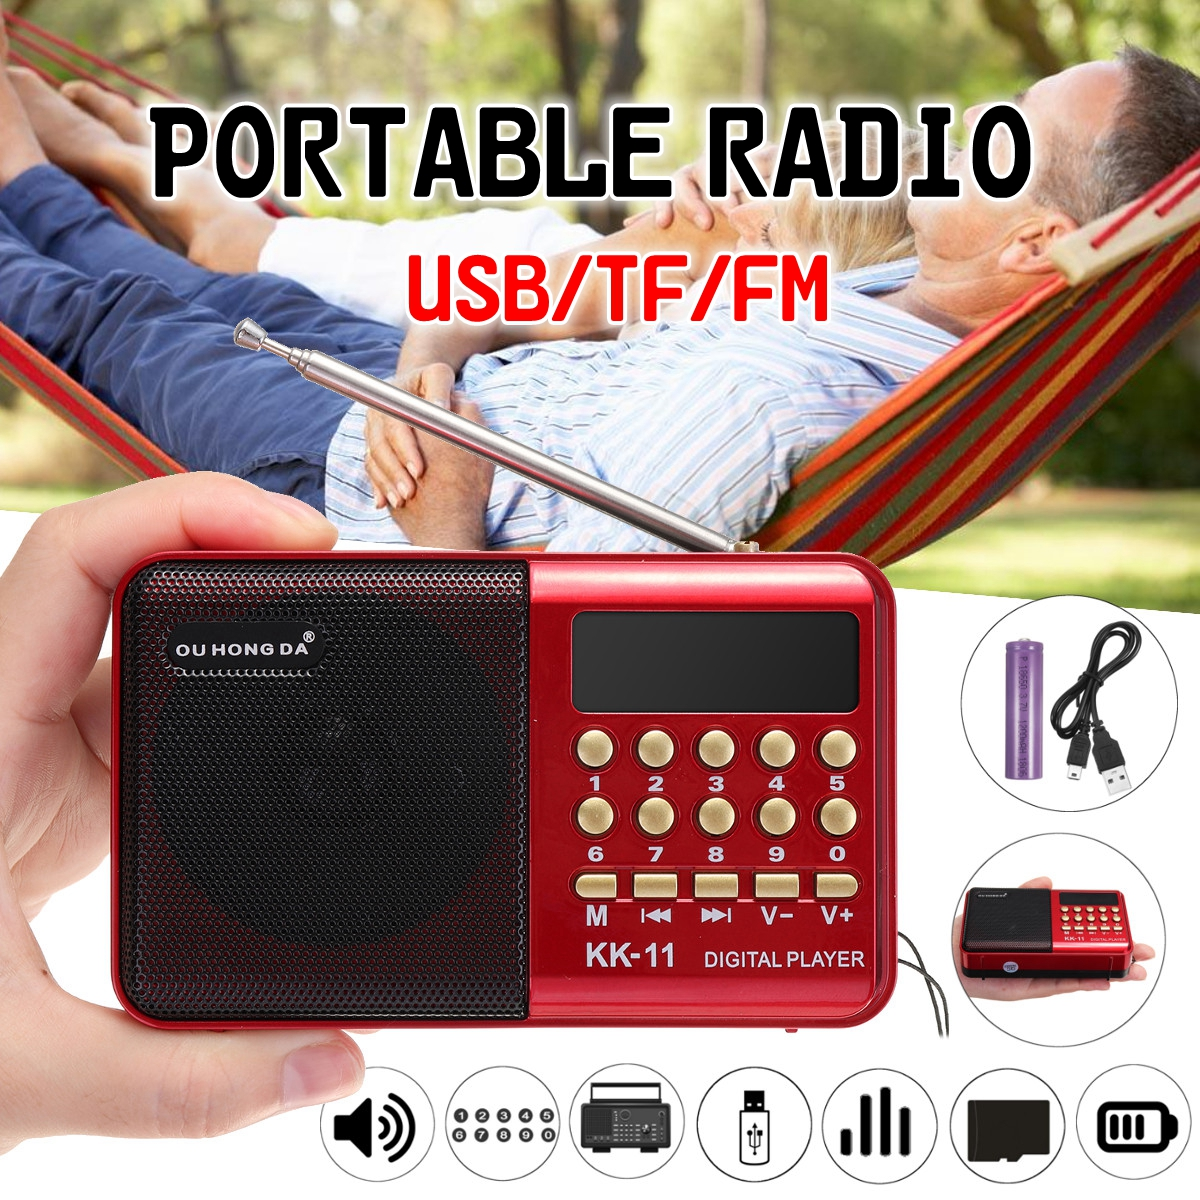 Portable Hifi Mini Multifunctional Digital Mp3 Radio Speaker Usb Tf Fm Radio Fad